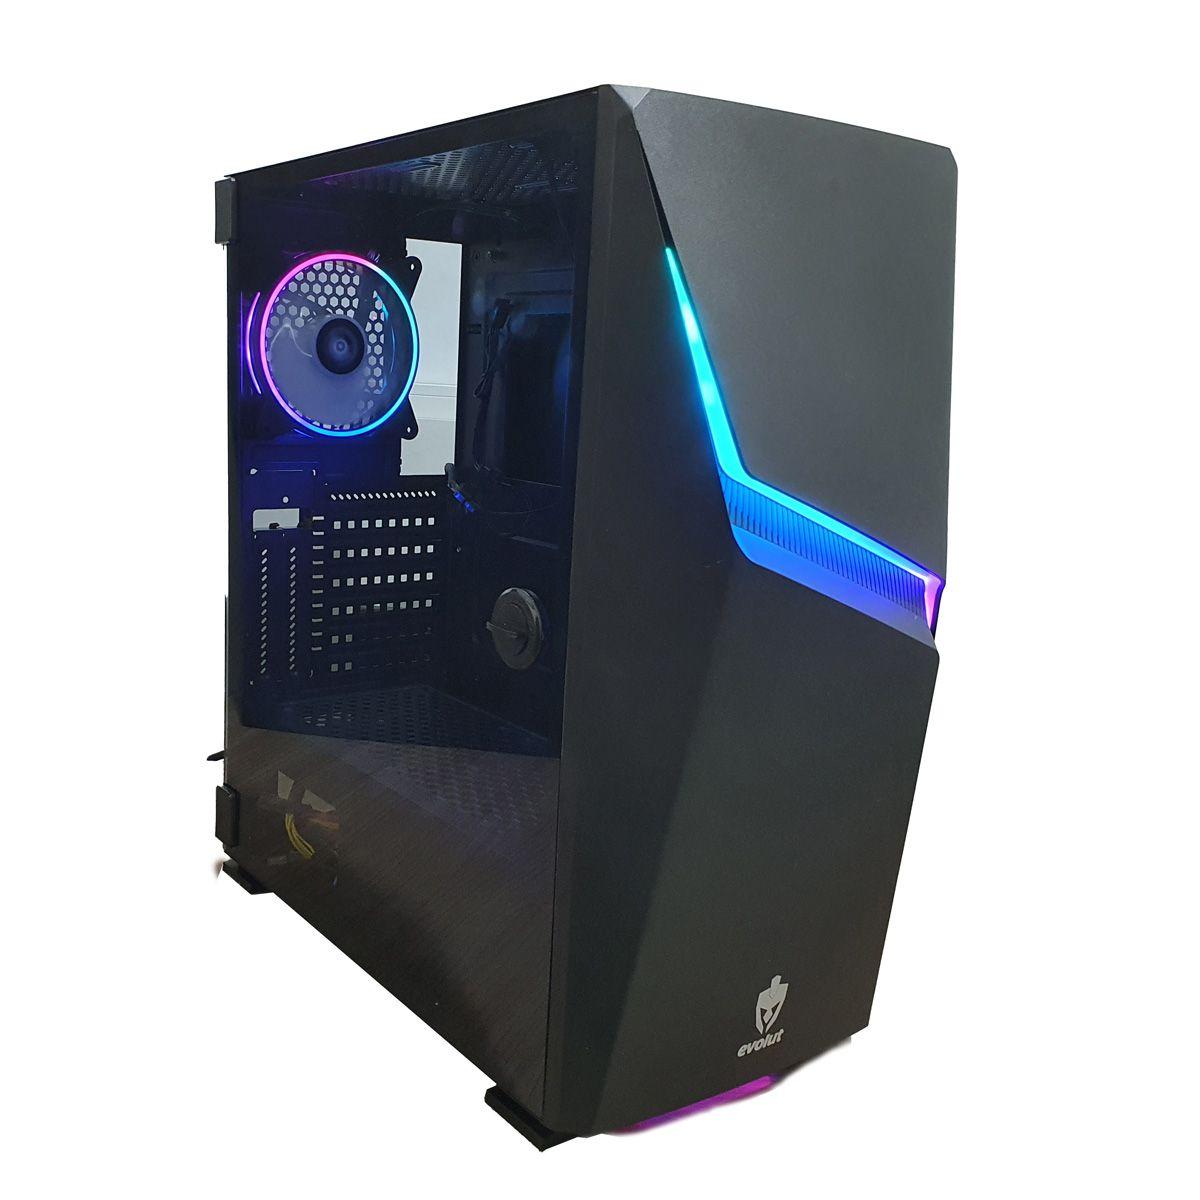 Gabinete para PC Gamer ASHE Evolut RGB Lateral em Vidro